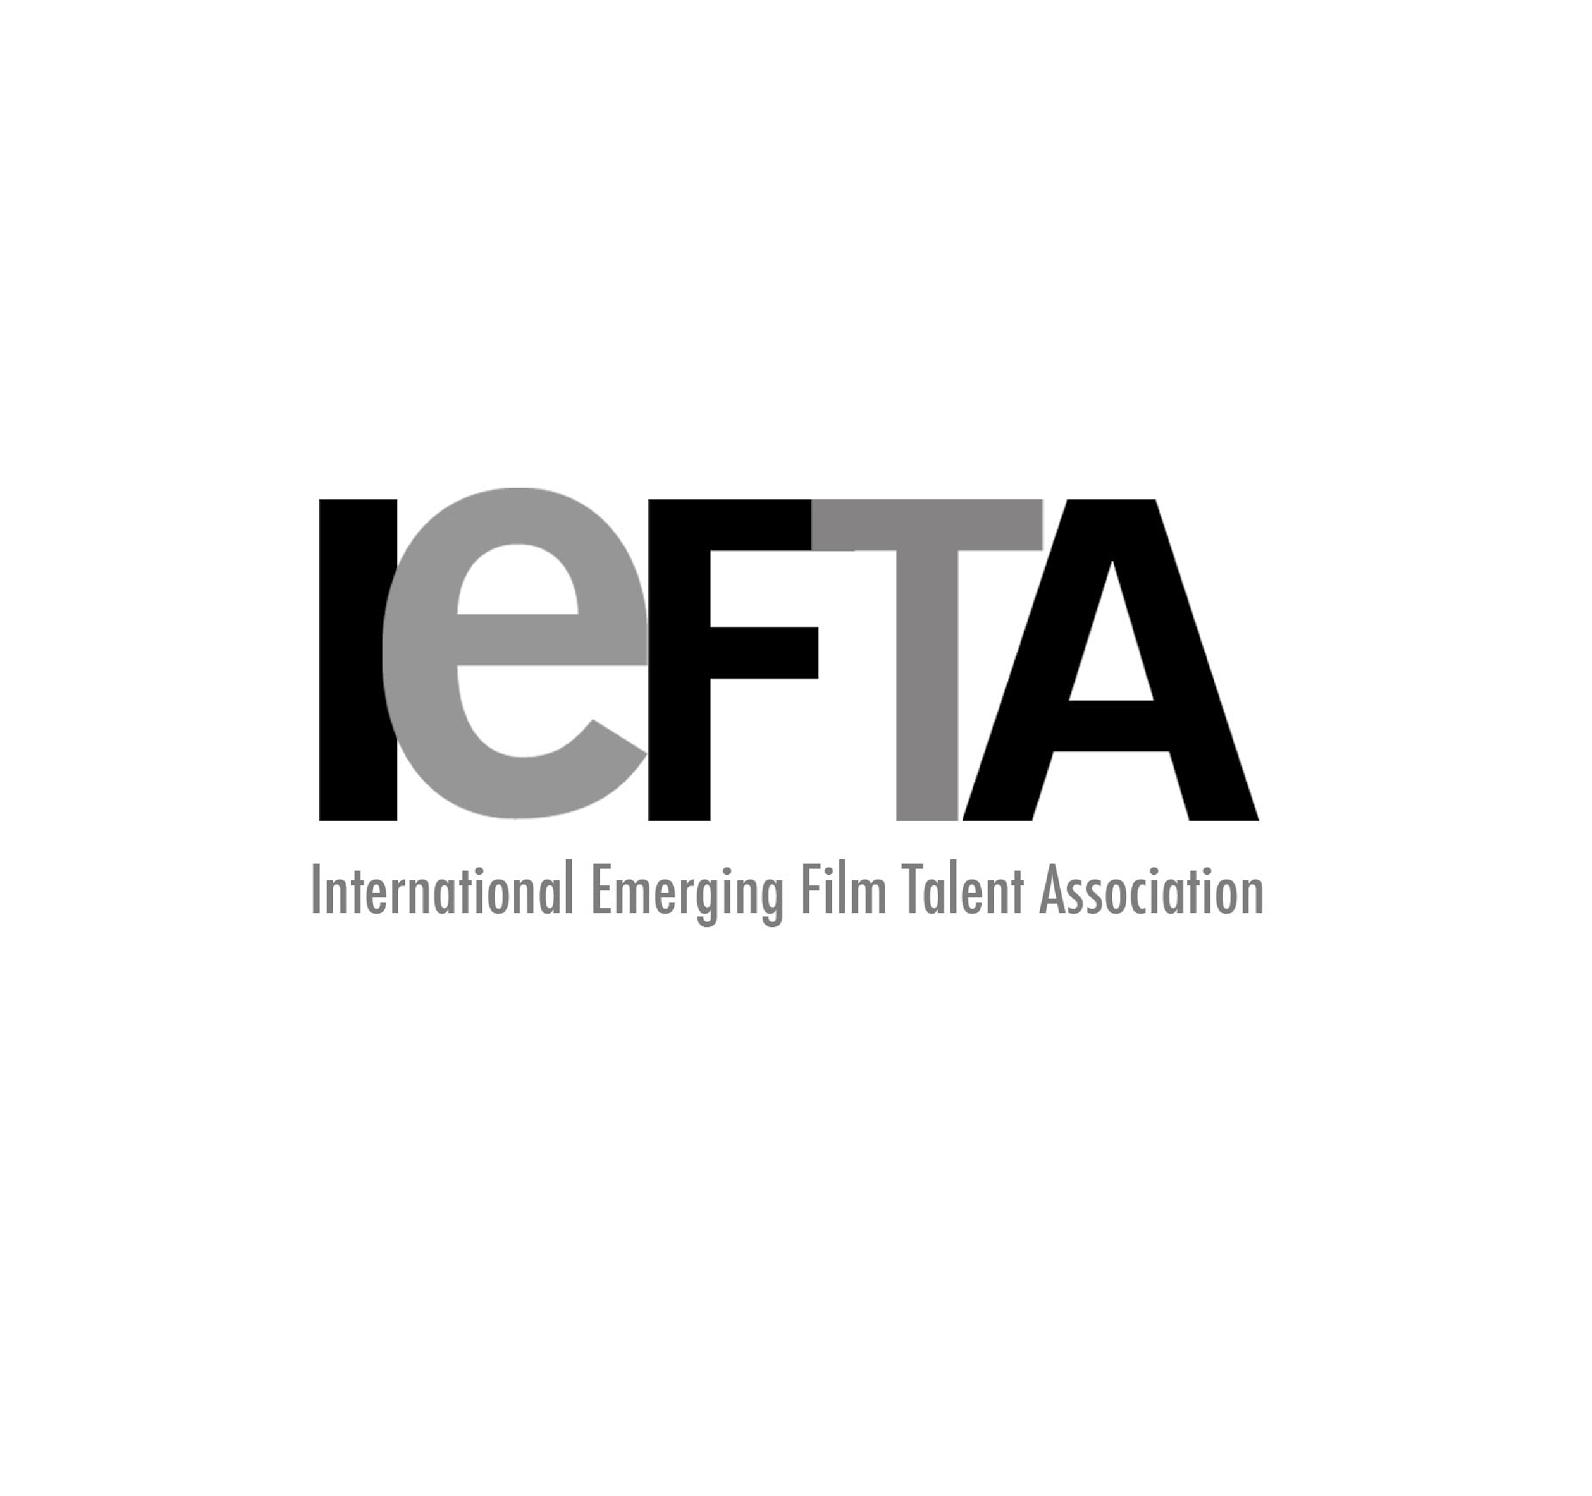 Logo-IEFTA.png